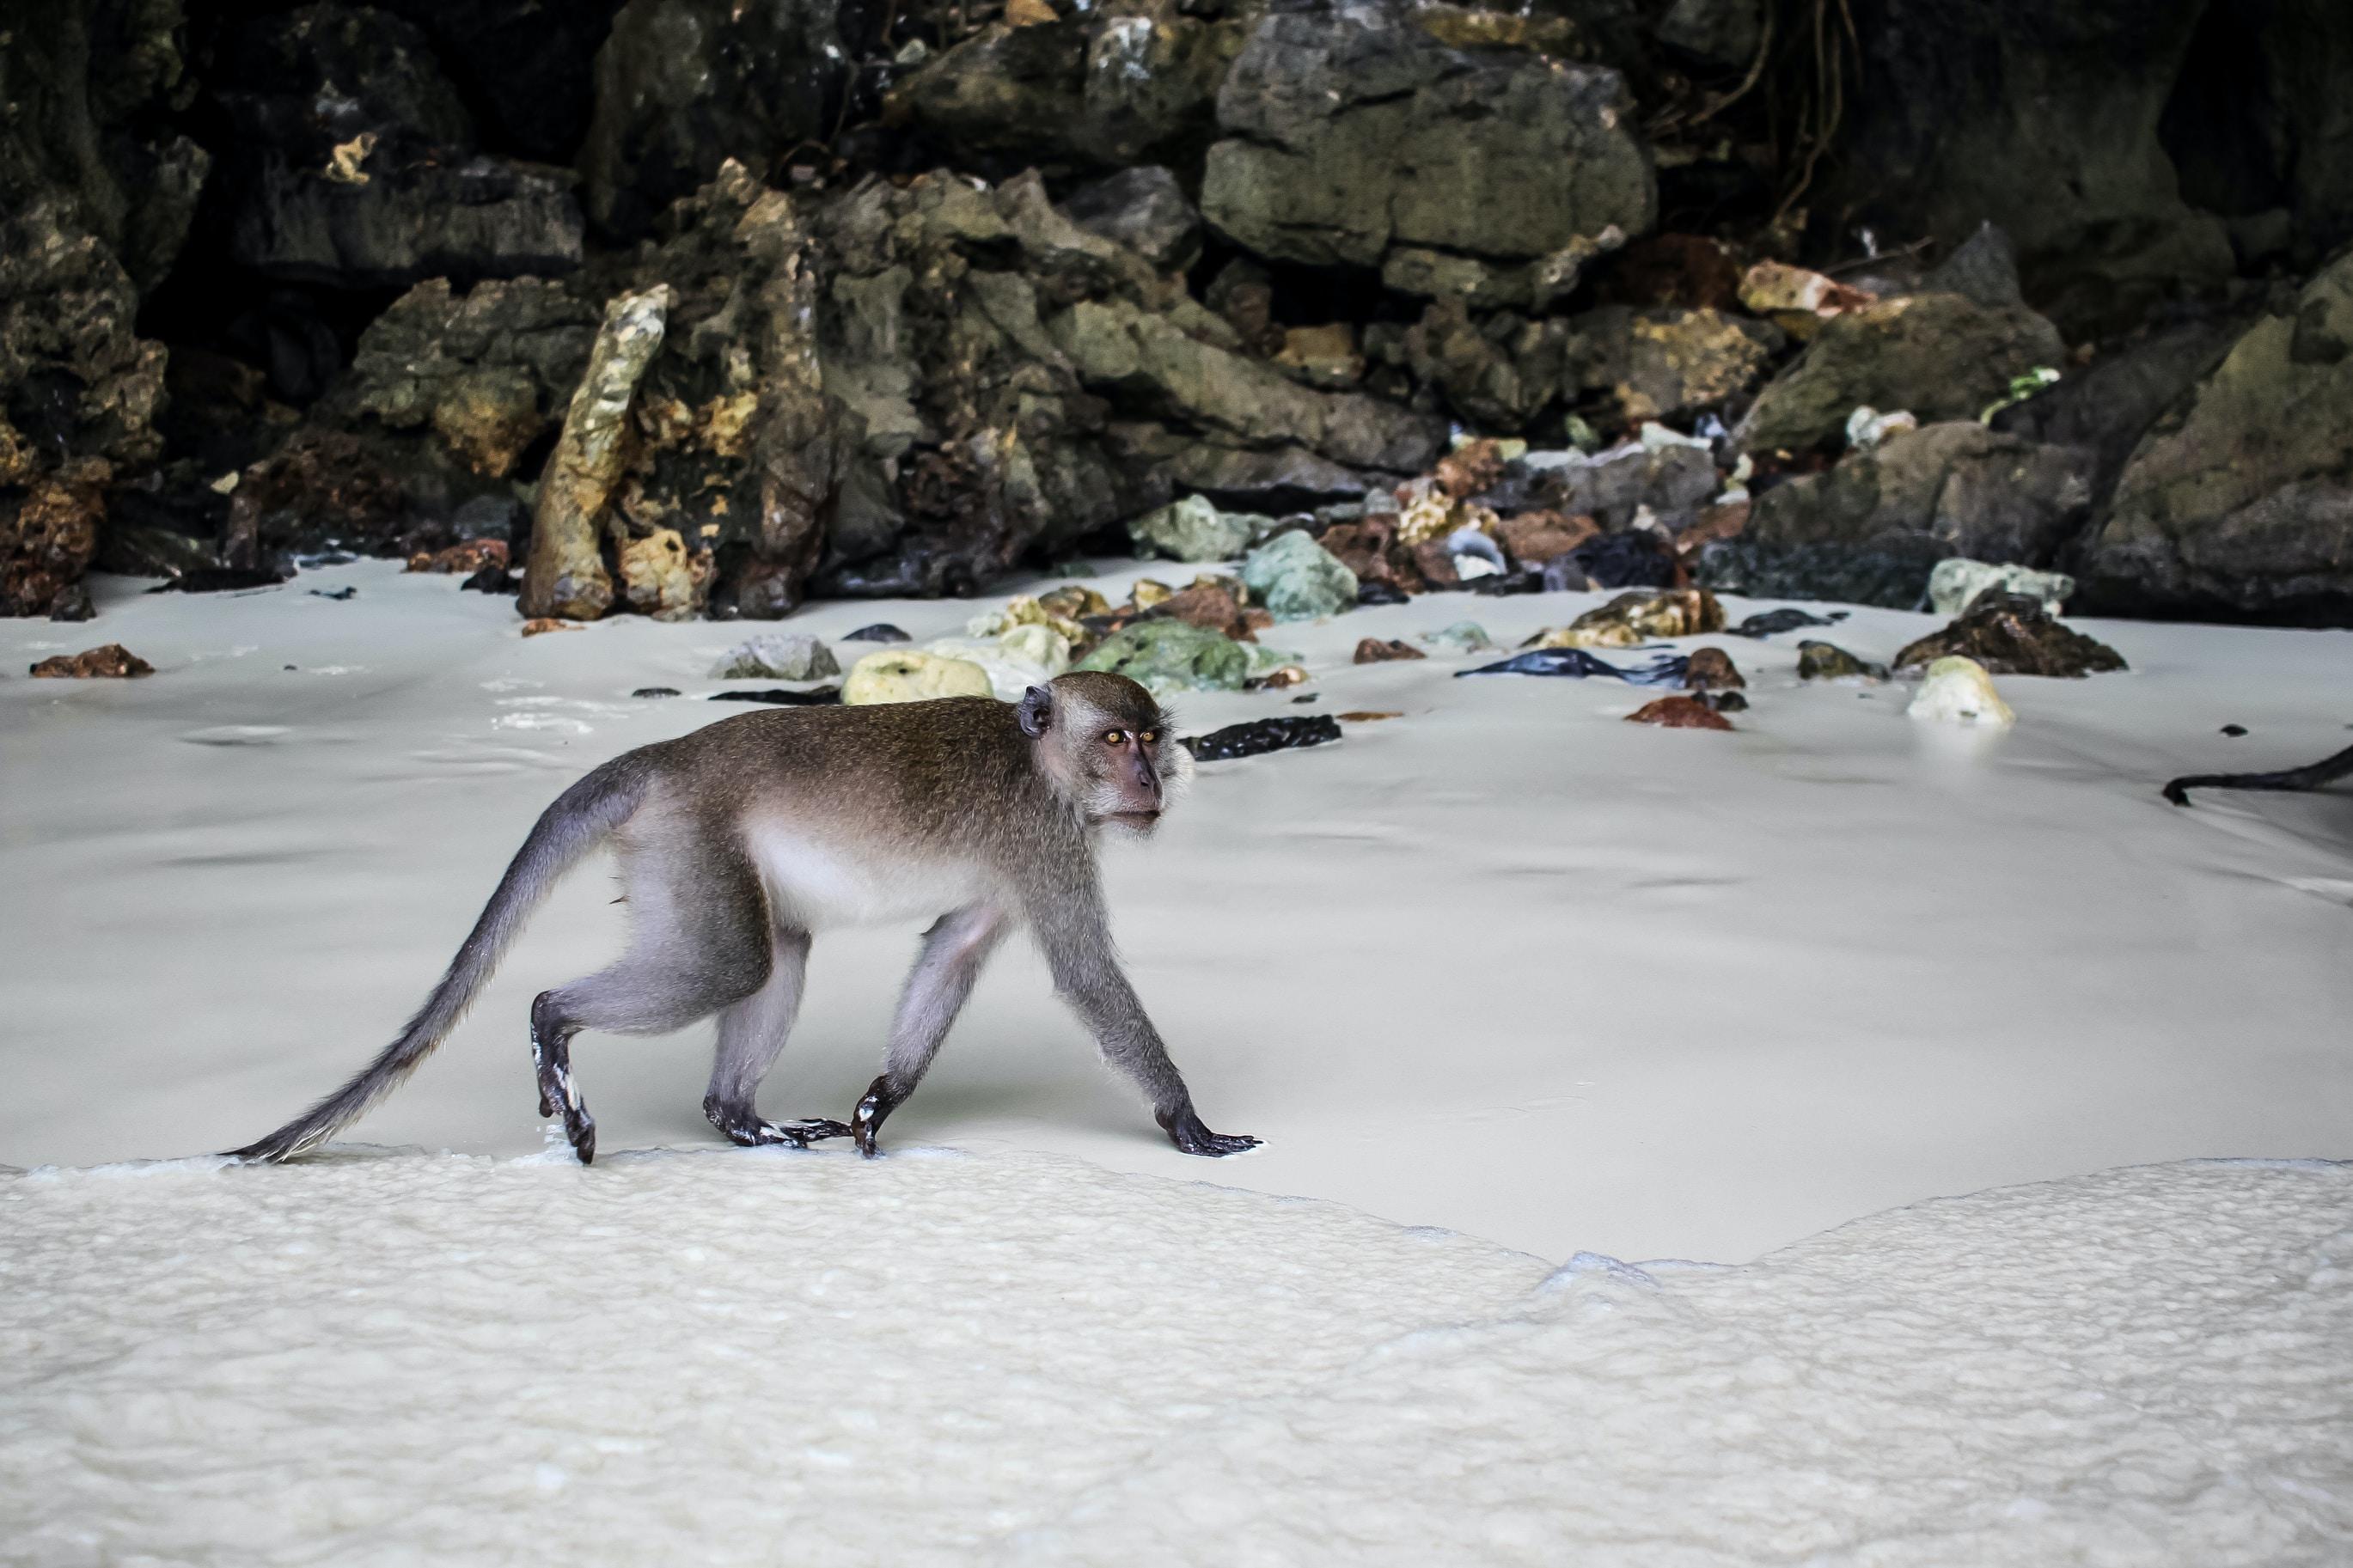 gray monkey crawling on white snow